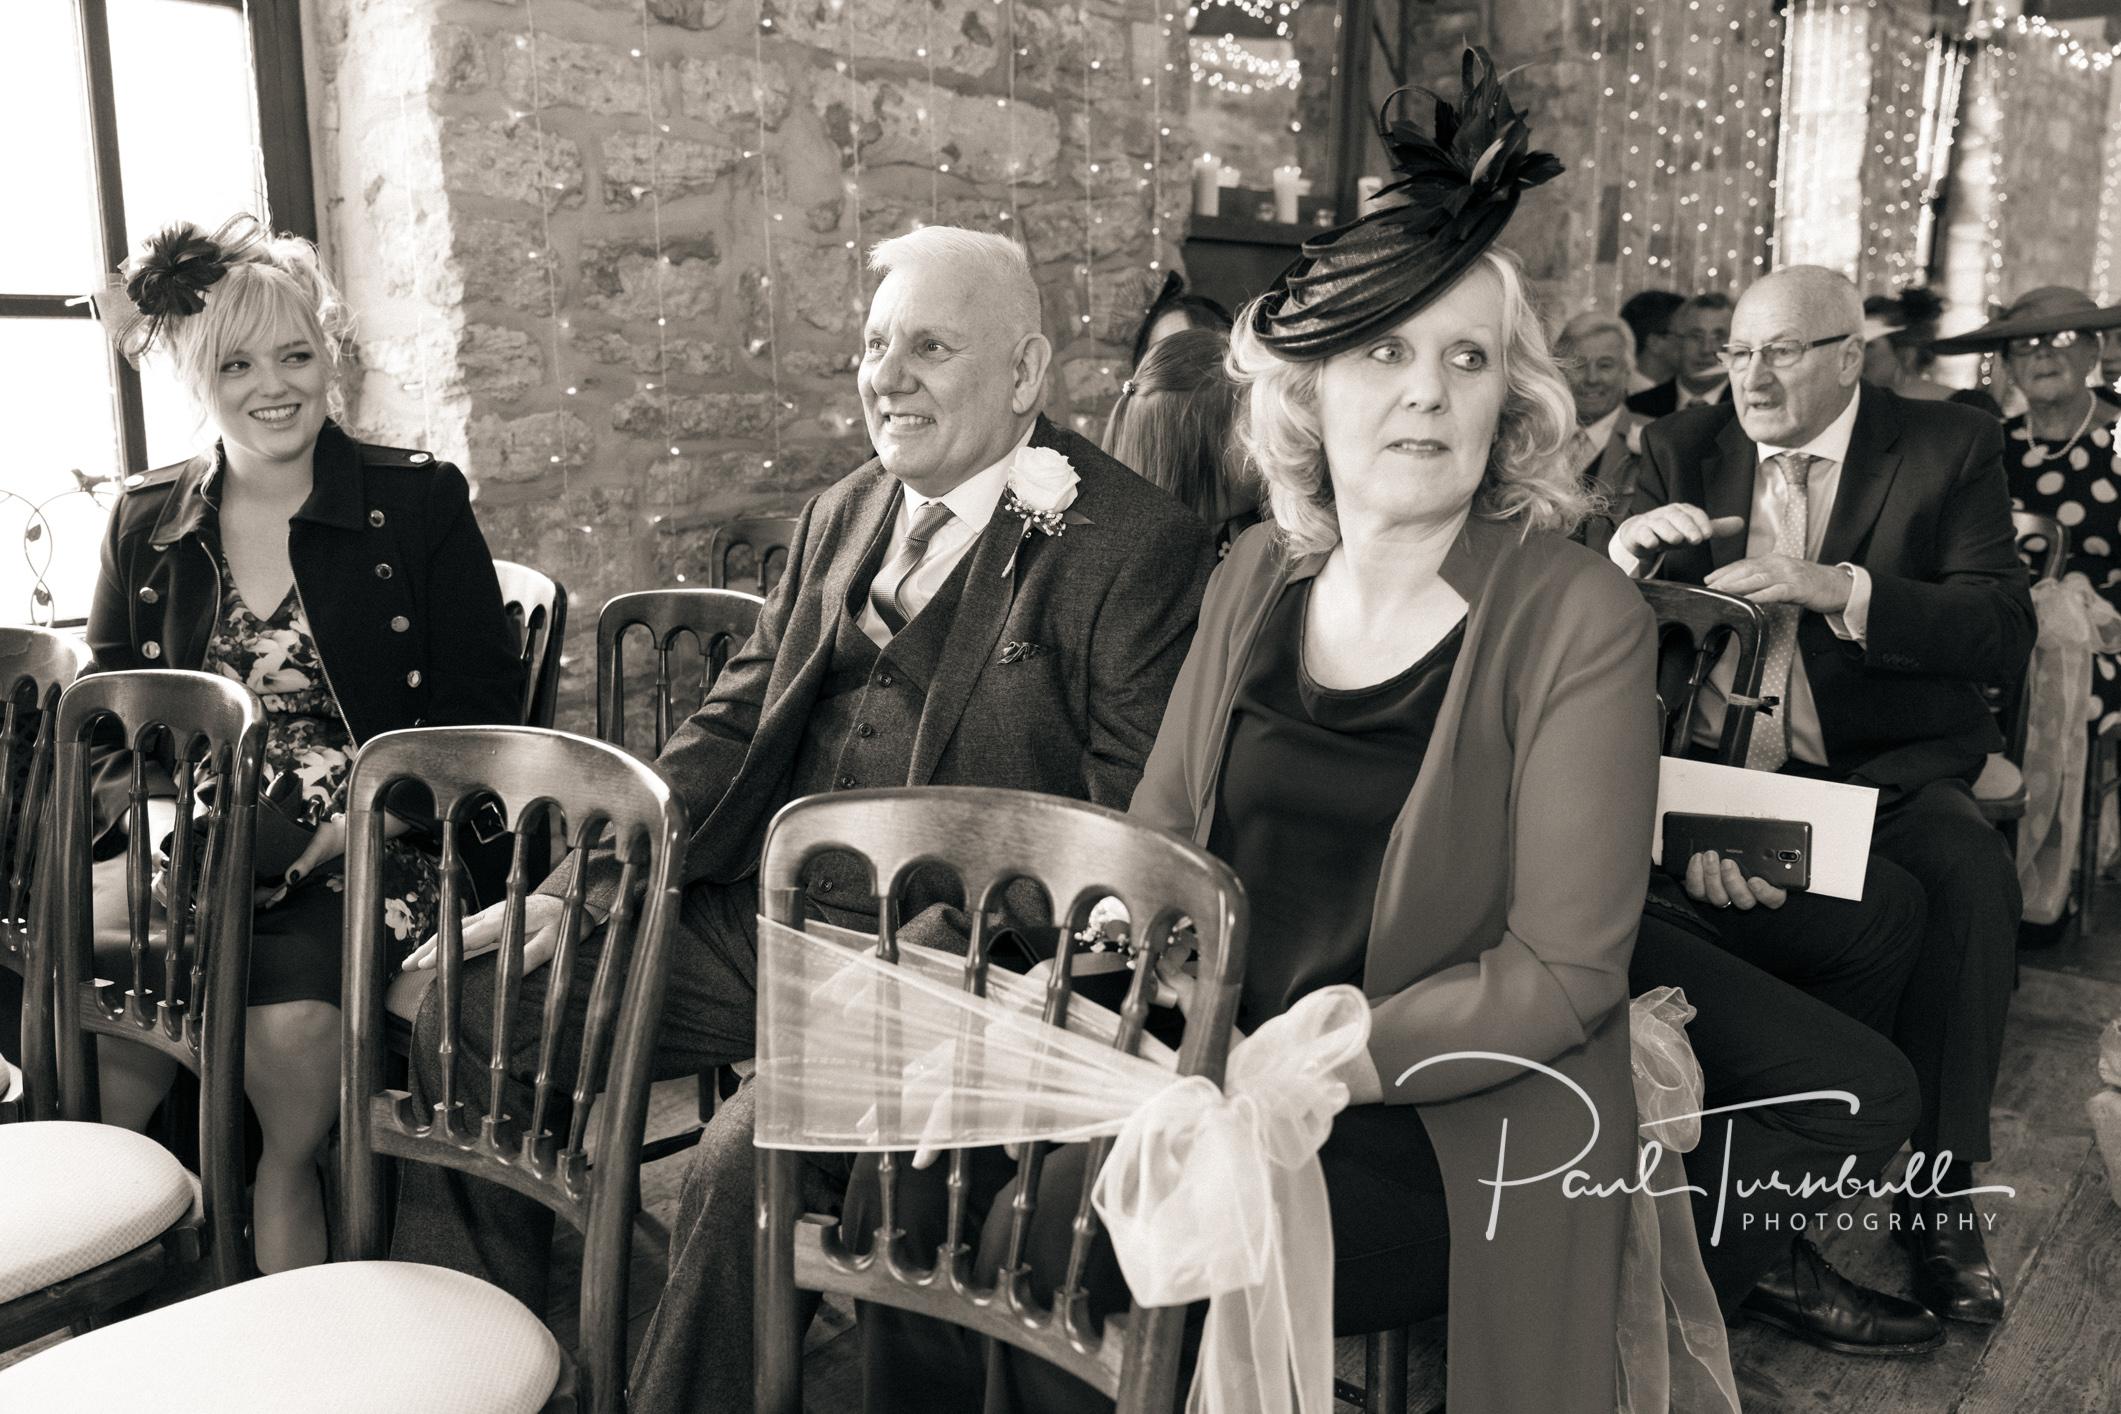 wedding-photographer-raven-hall-ravenscroft--scarborough-yorkshire-lucy-ryan-027.jpg